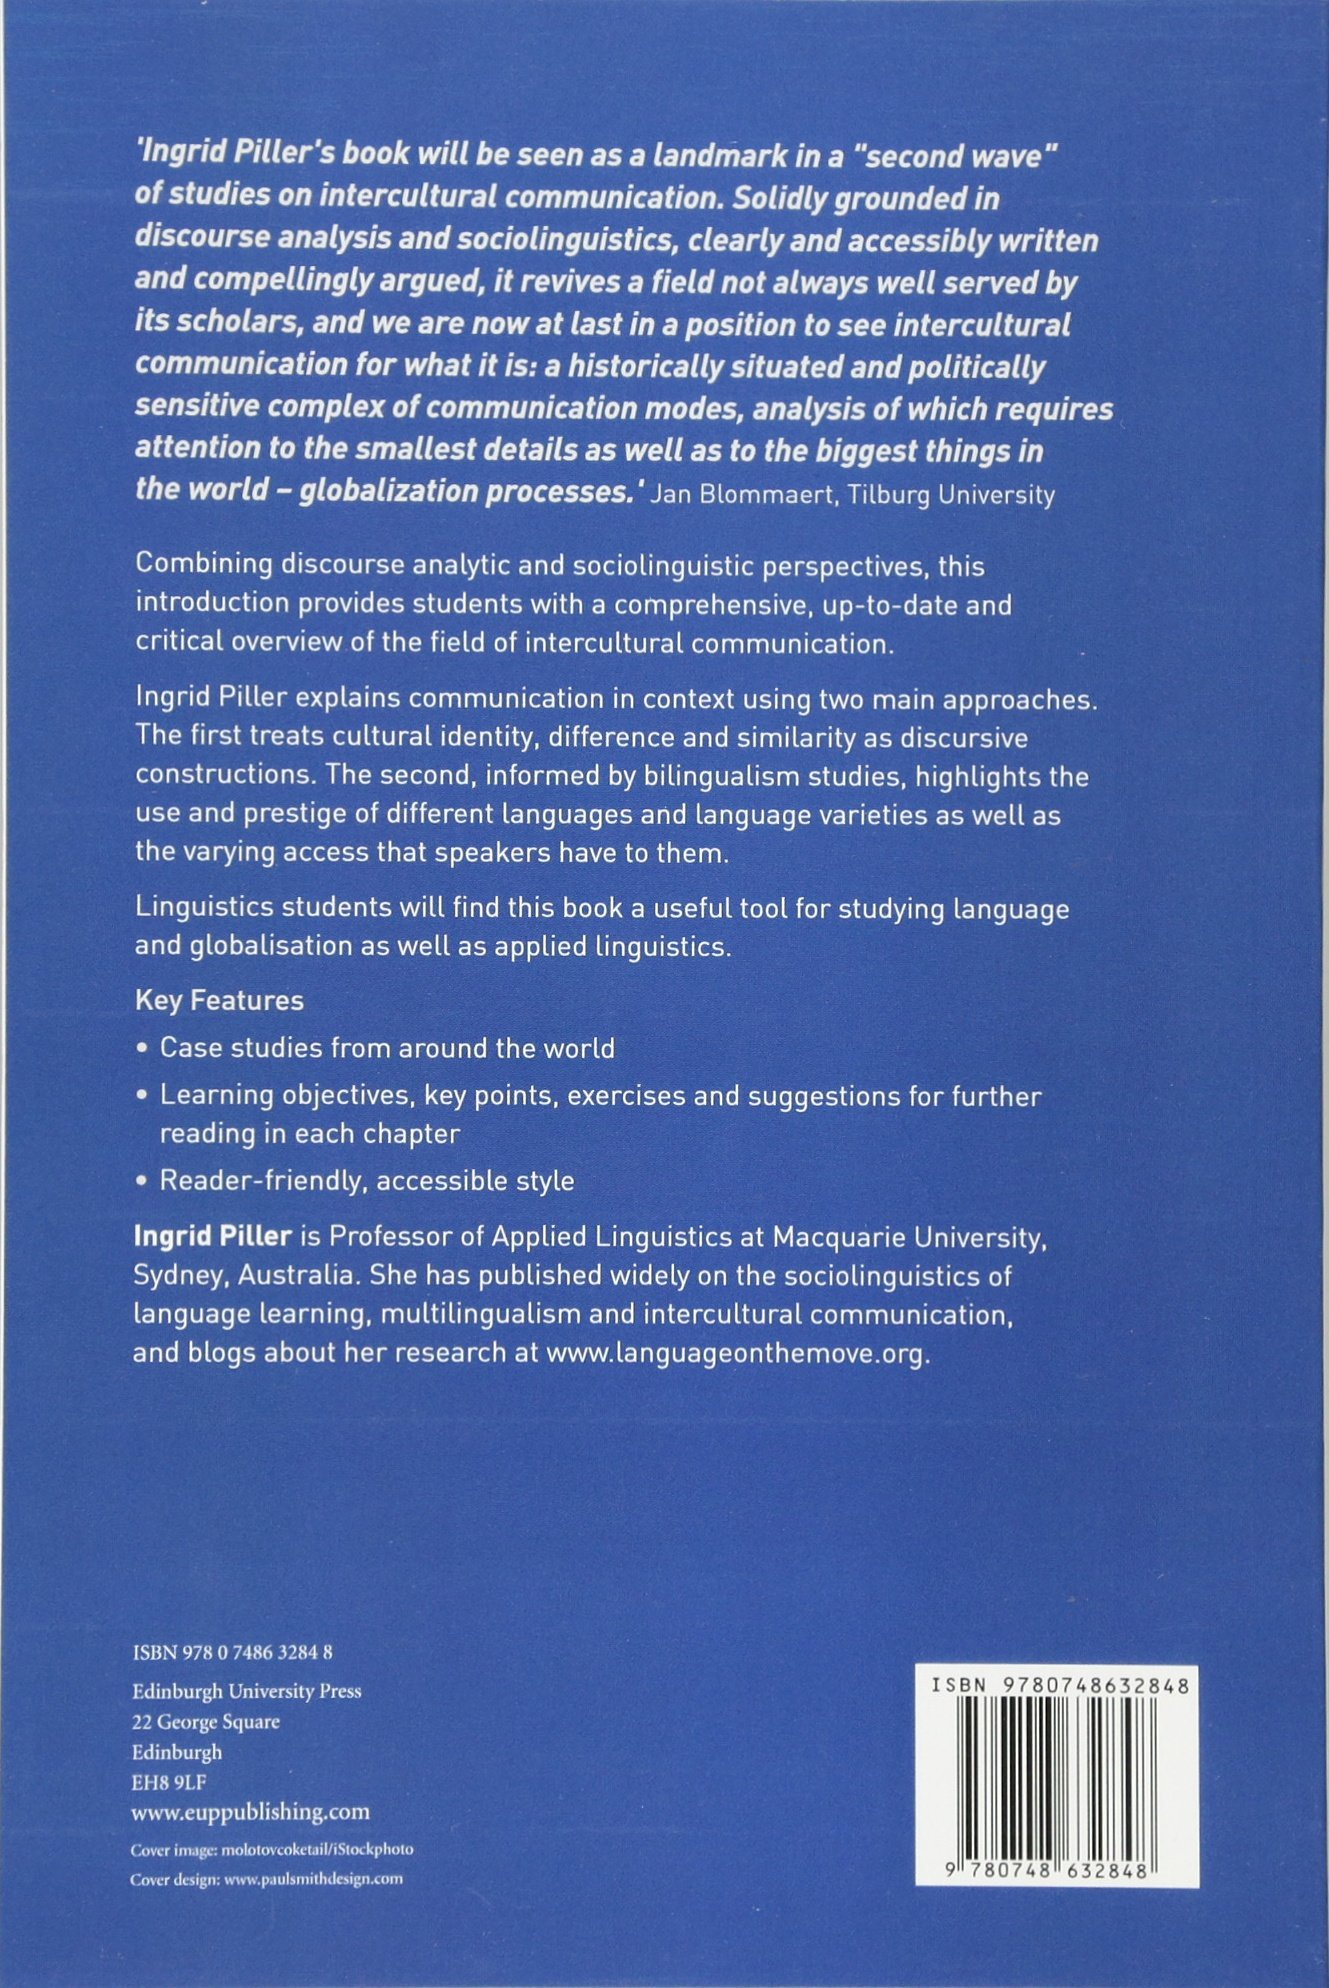 Intercultural Communication: A Critical Introduction: Amazon